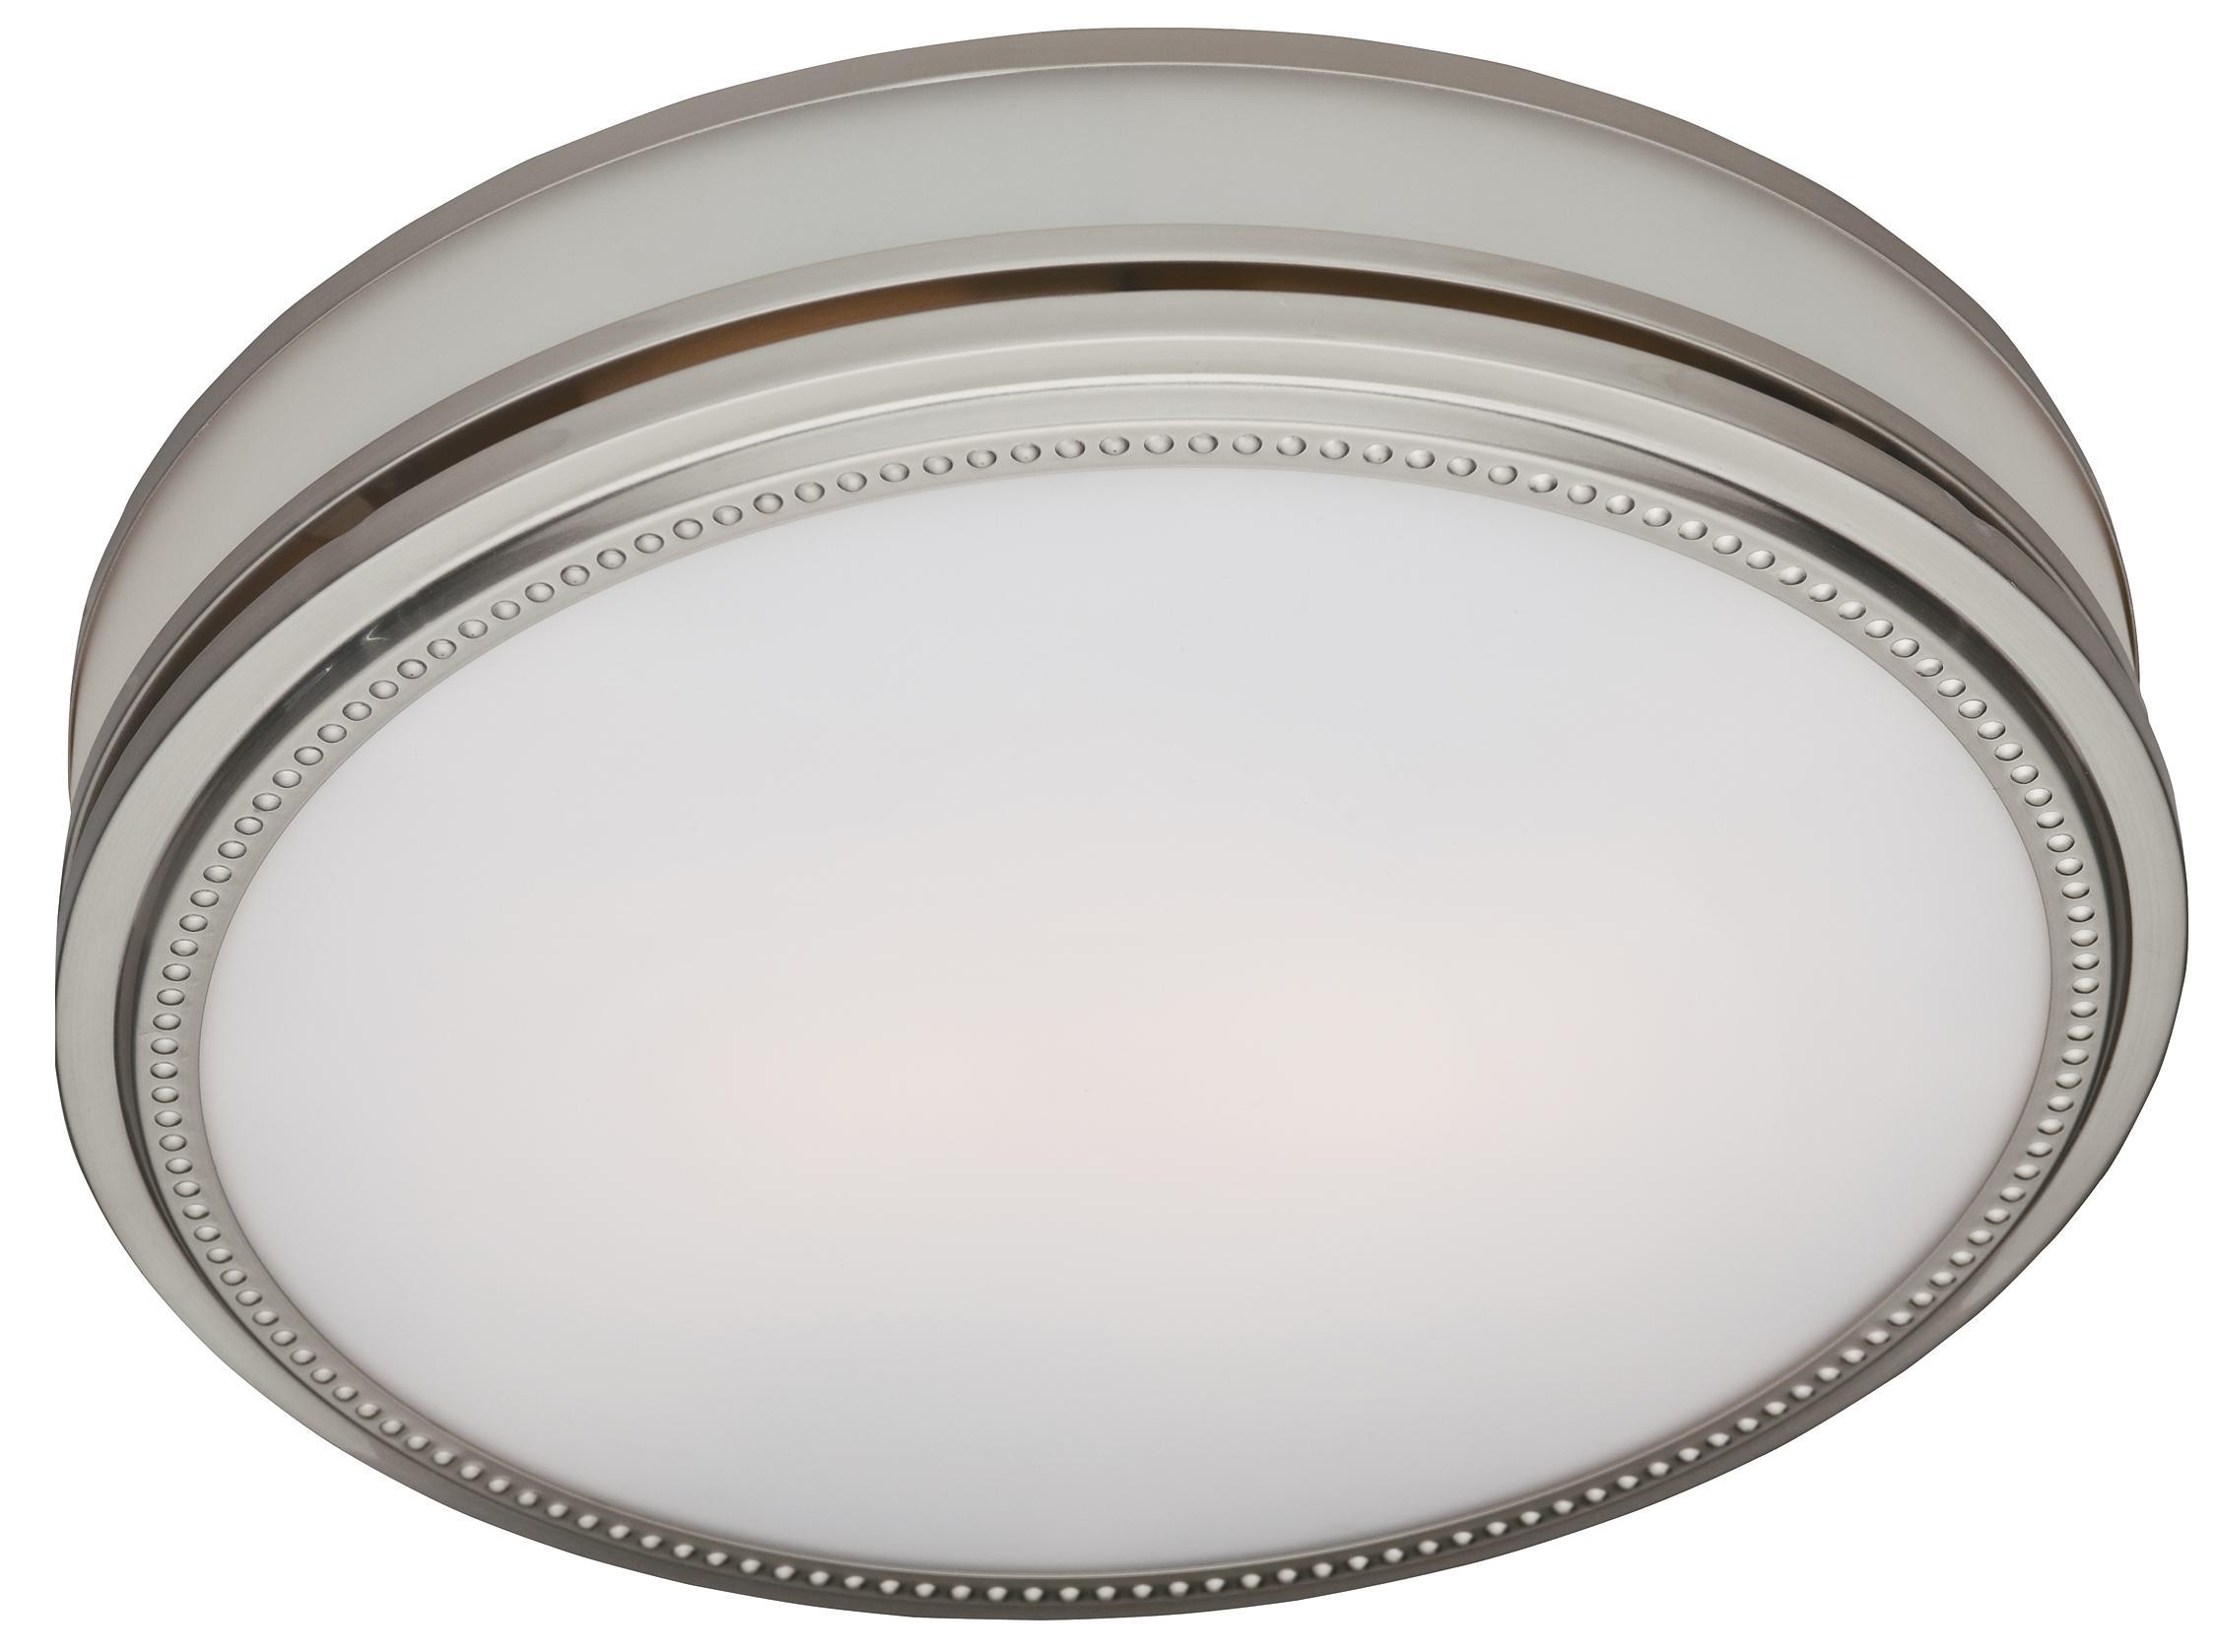 Hunter 83001 Ventilation Riazzi Bathroom Exhaust Fan With